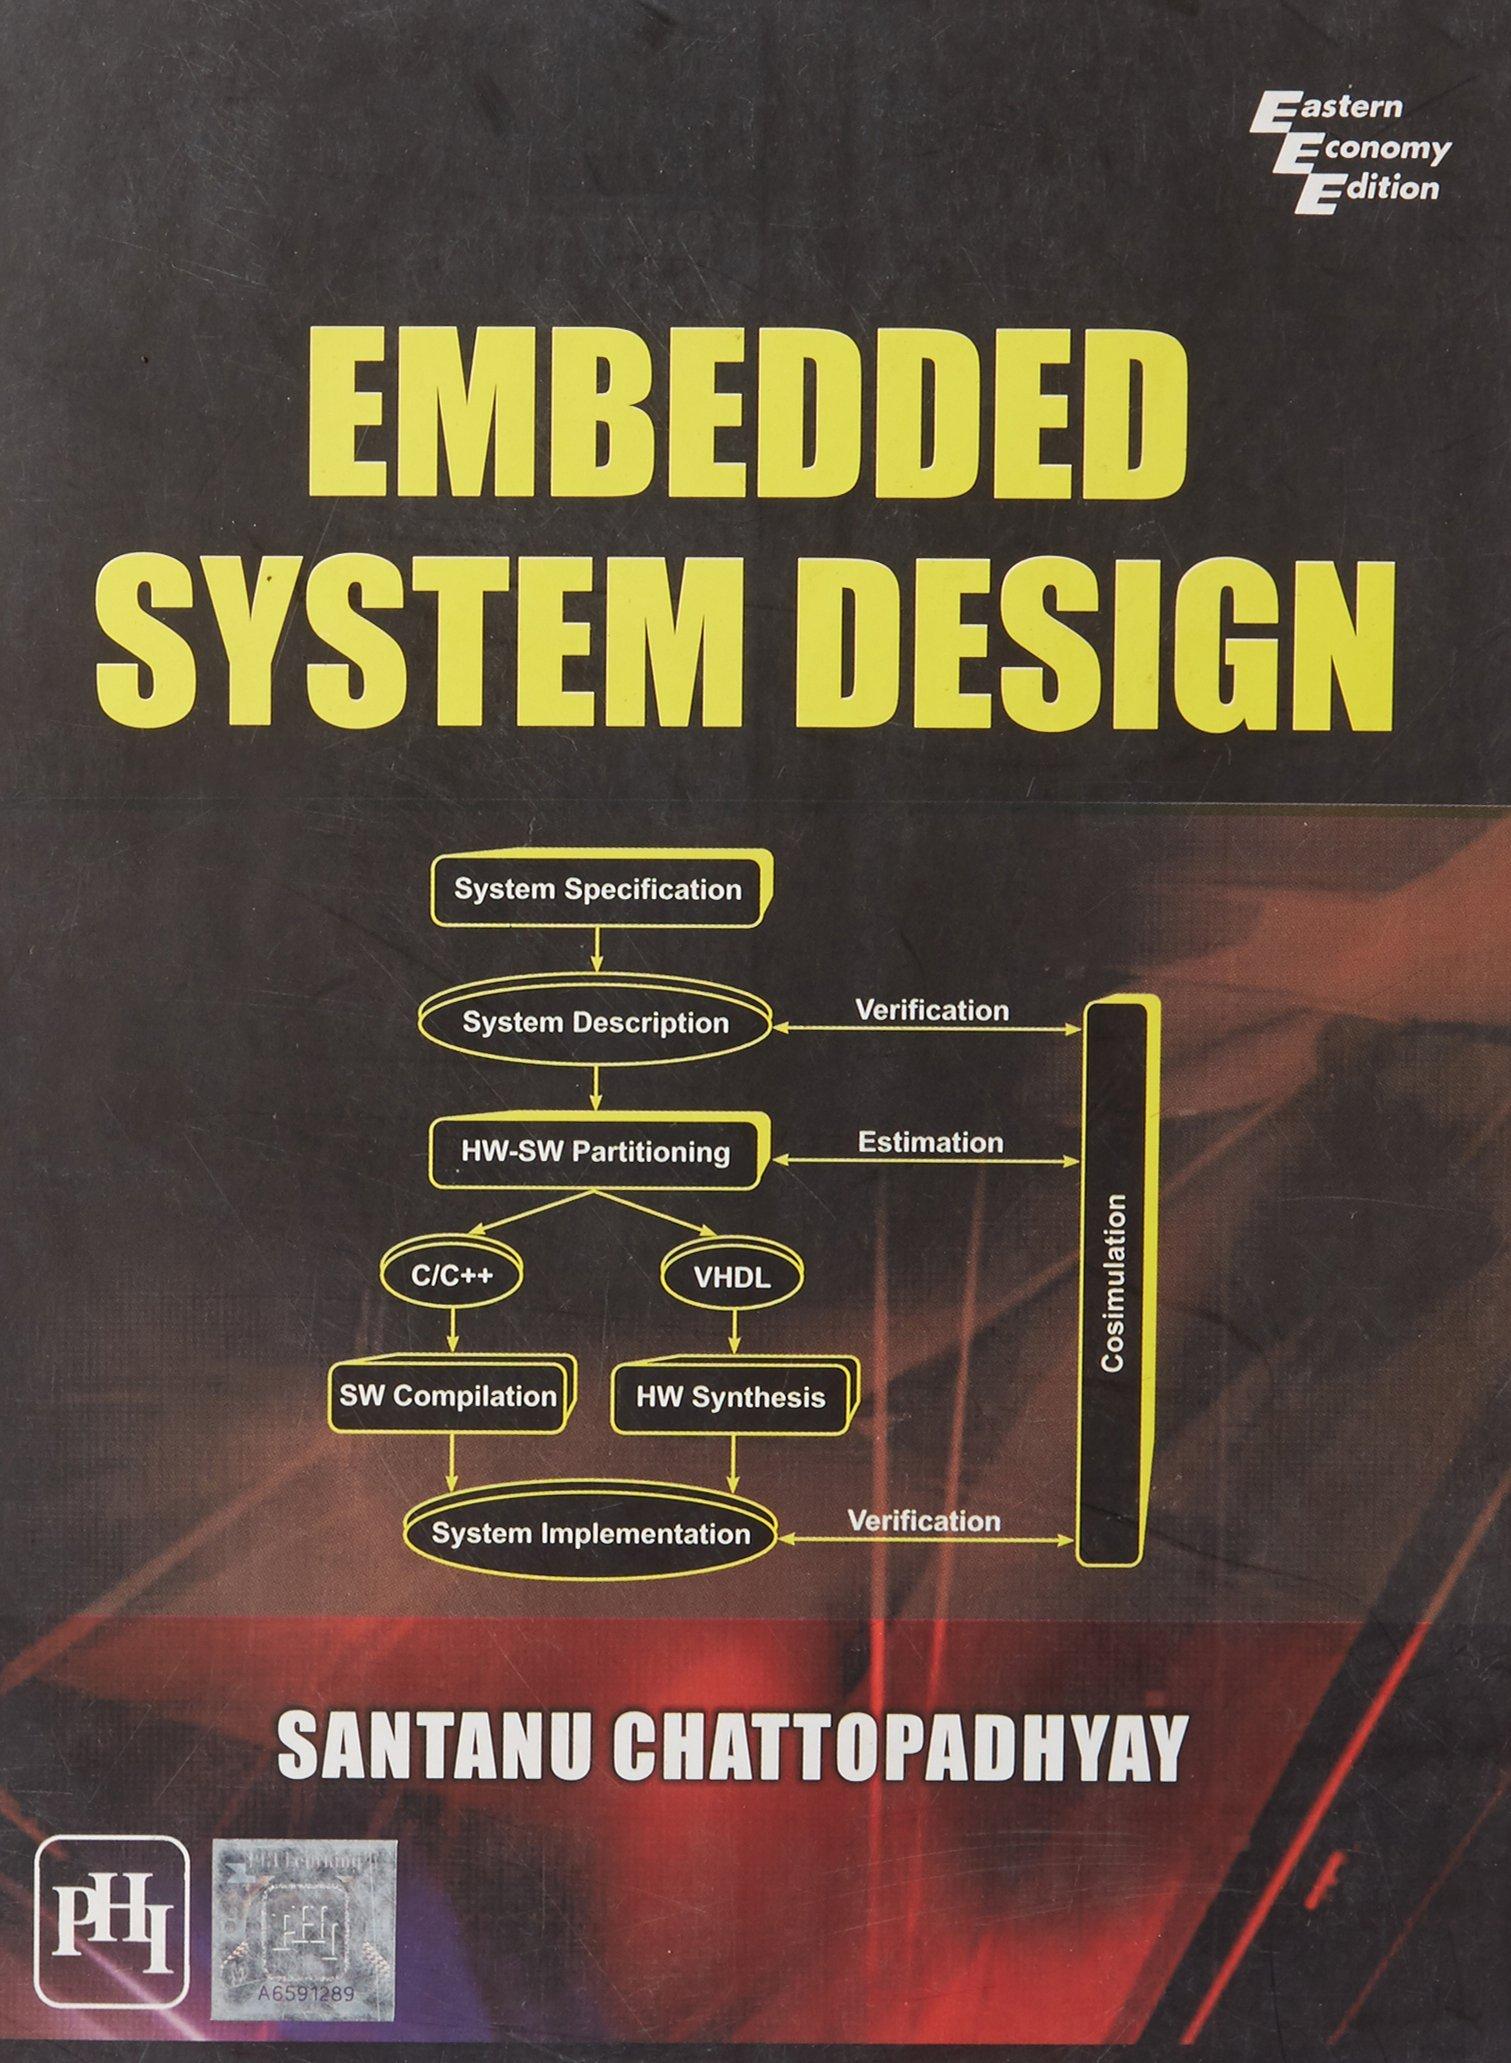 Embedded System Design Santanu Chattopadhyay 9788120340244 Amazon Com Books